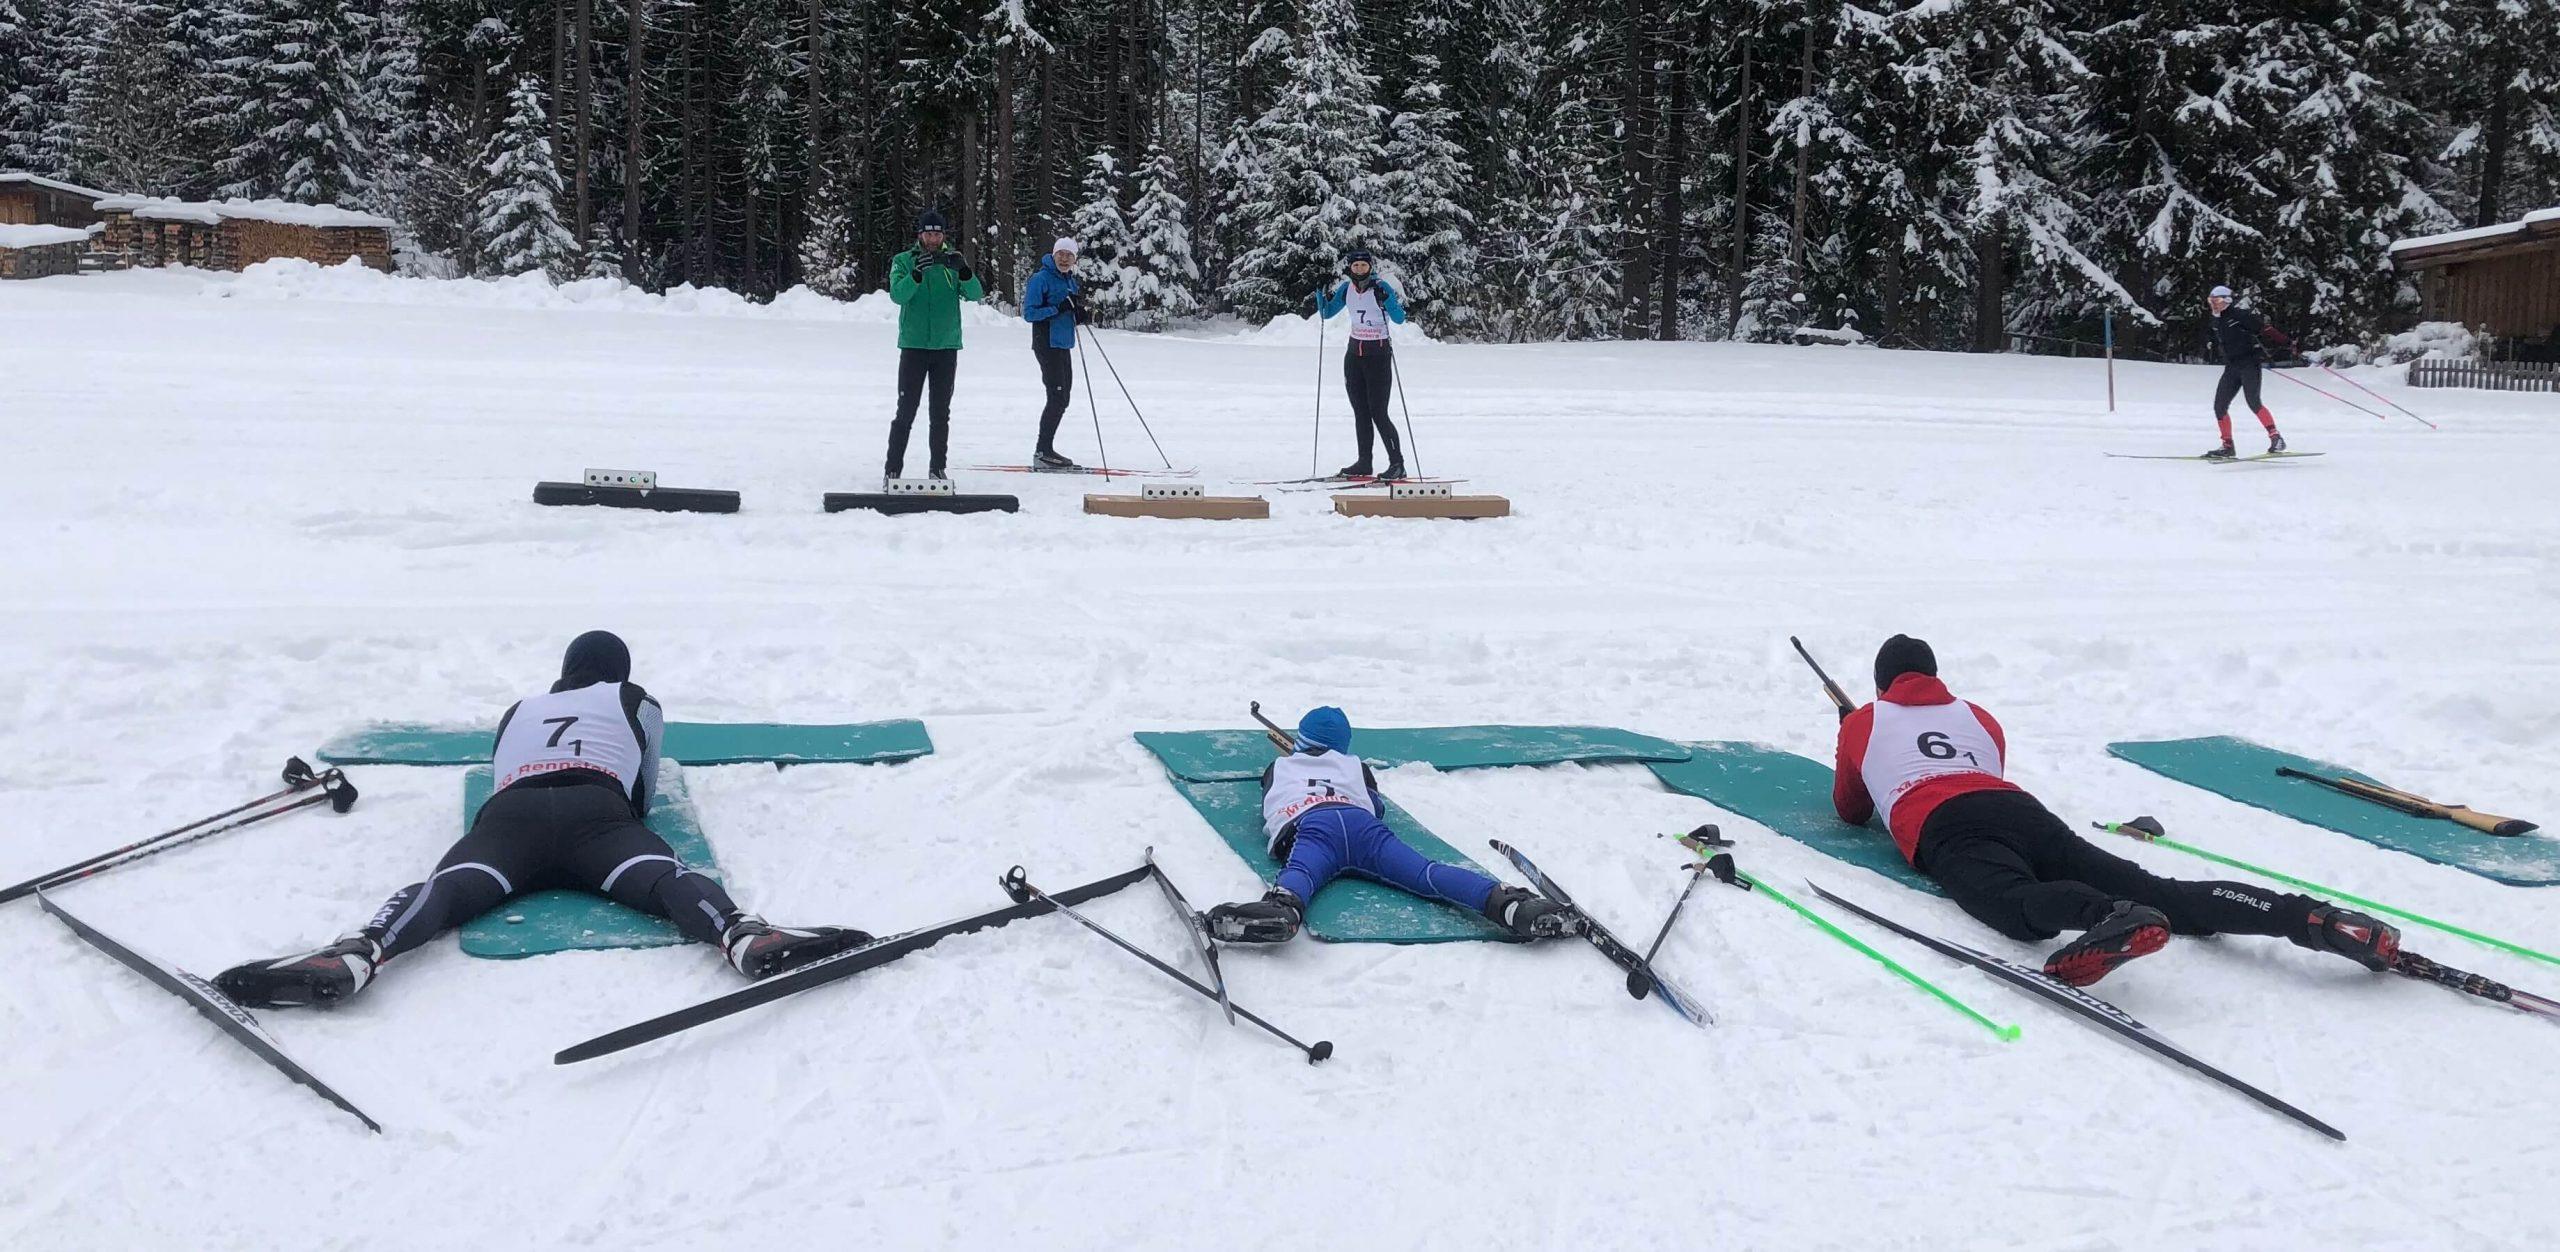 Langlauf Technik Trainingslager Biathlon